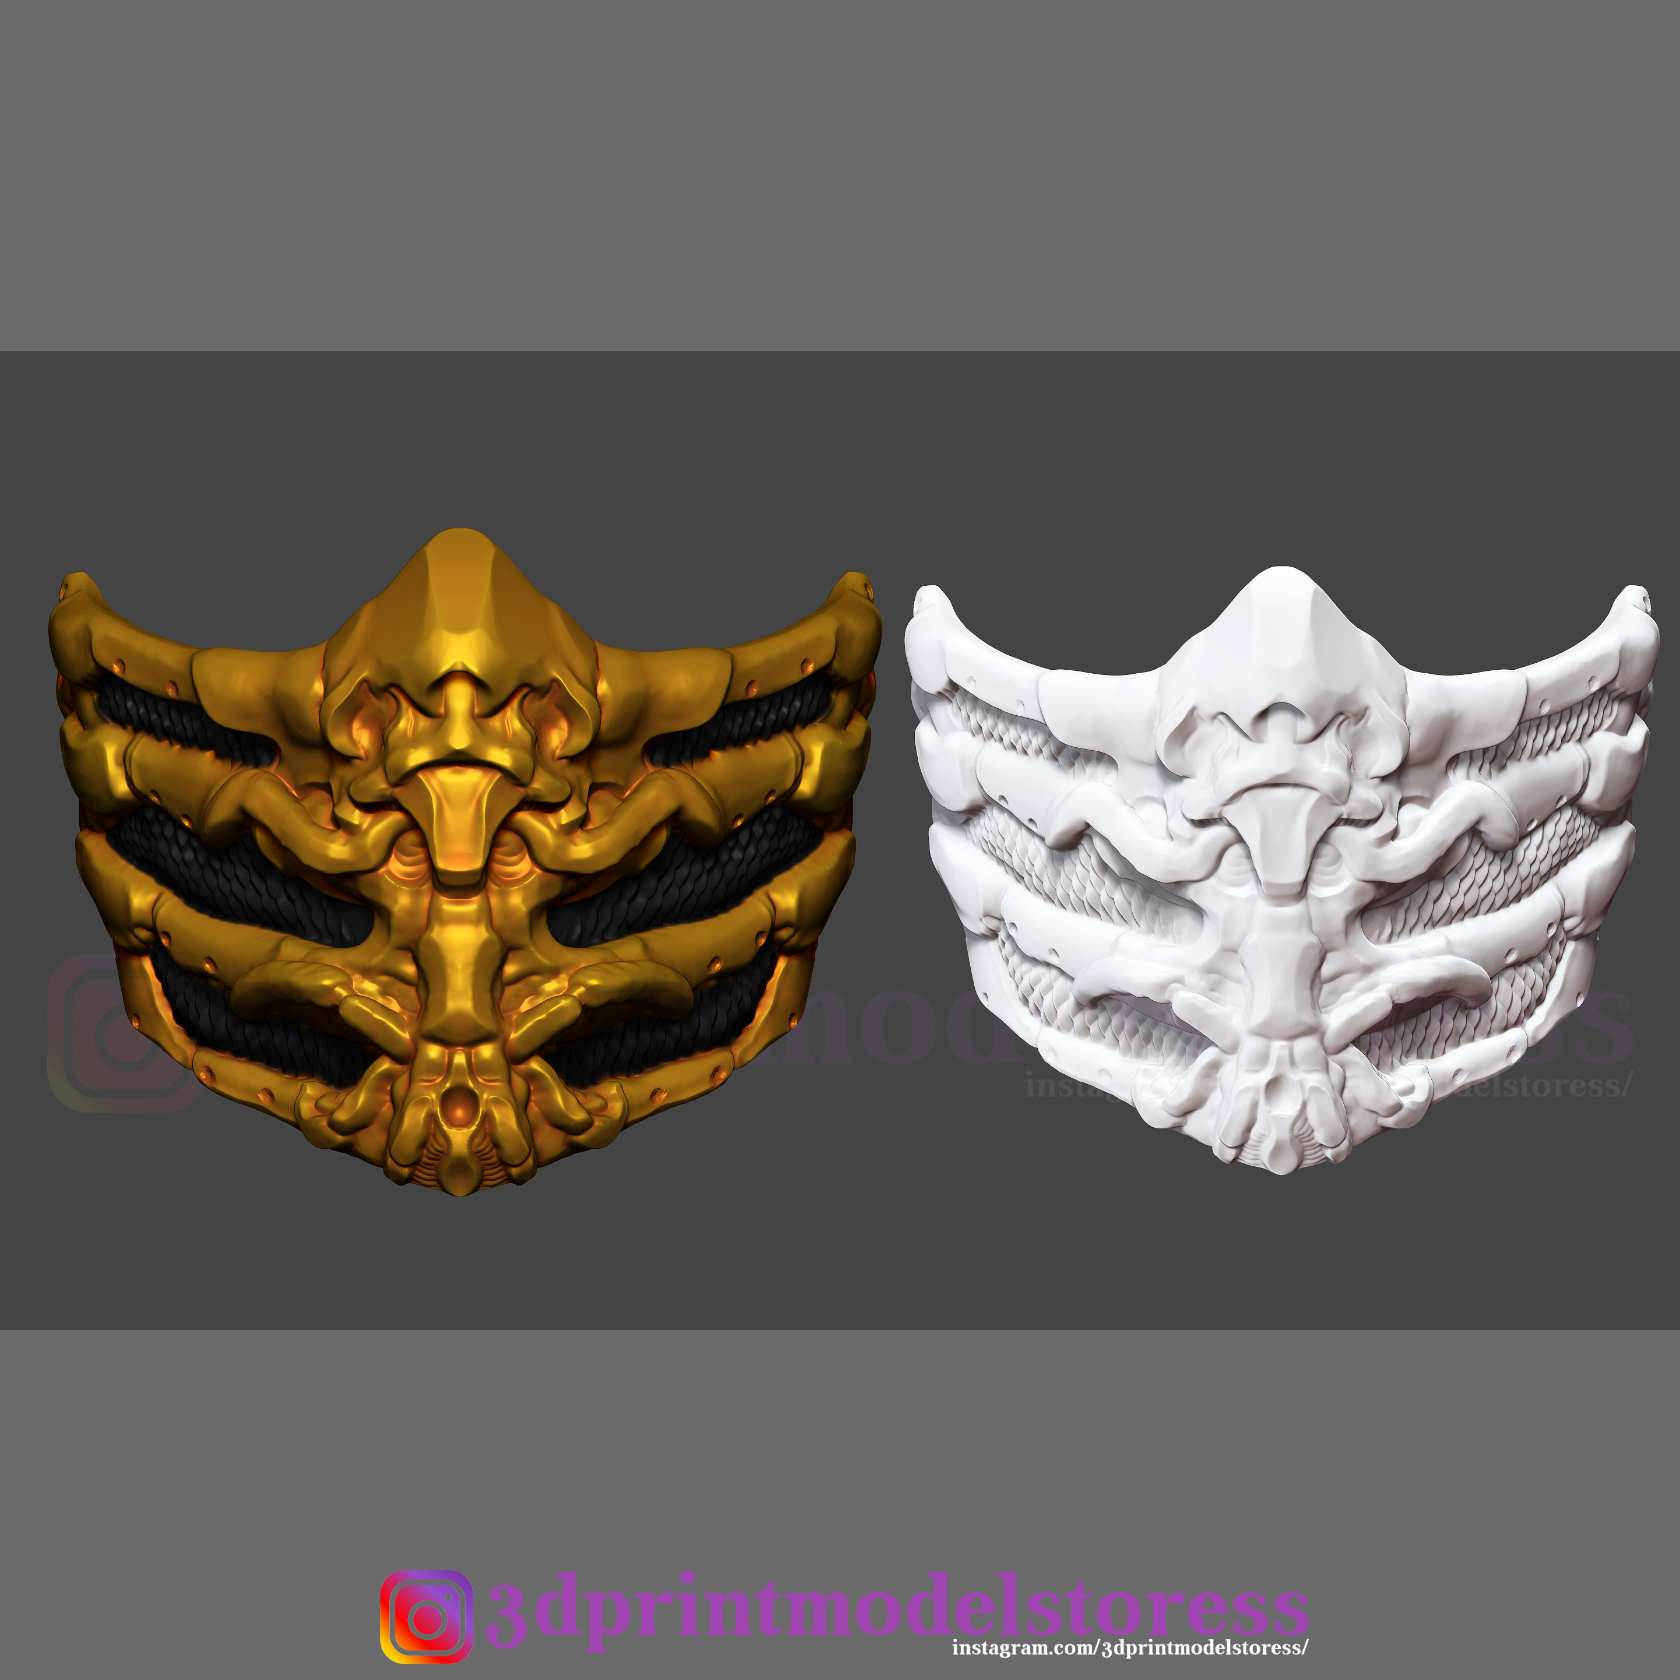 3d Printed Scorpion Mask From Mortal Kombat Halloween Costume